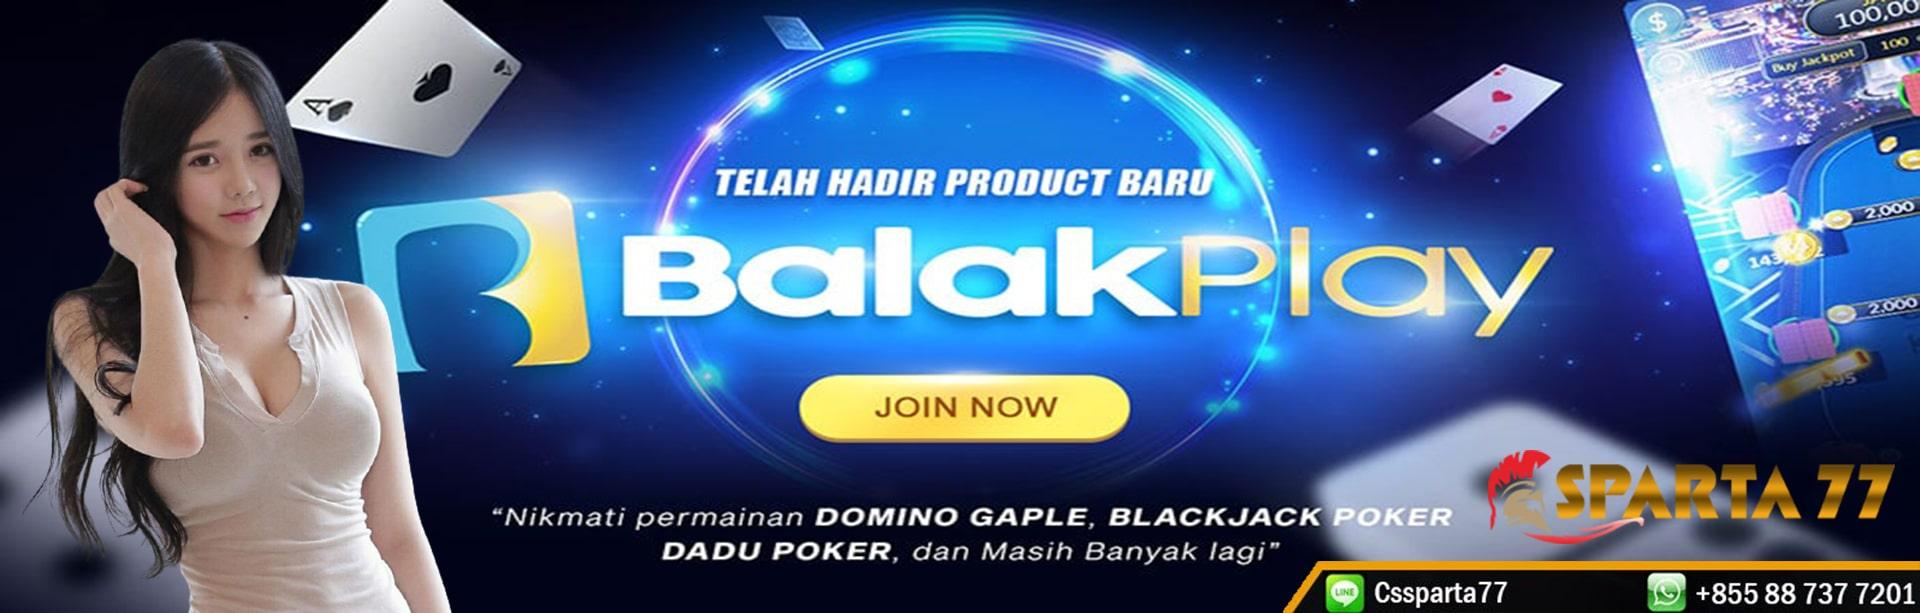 balak play poker